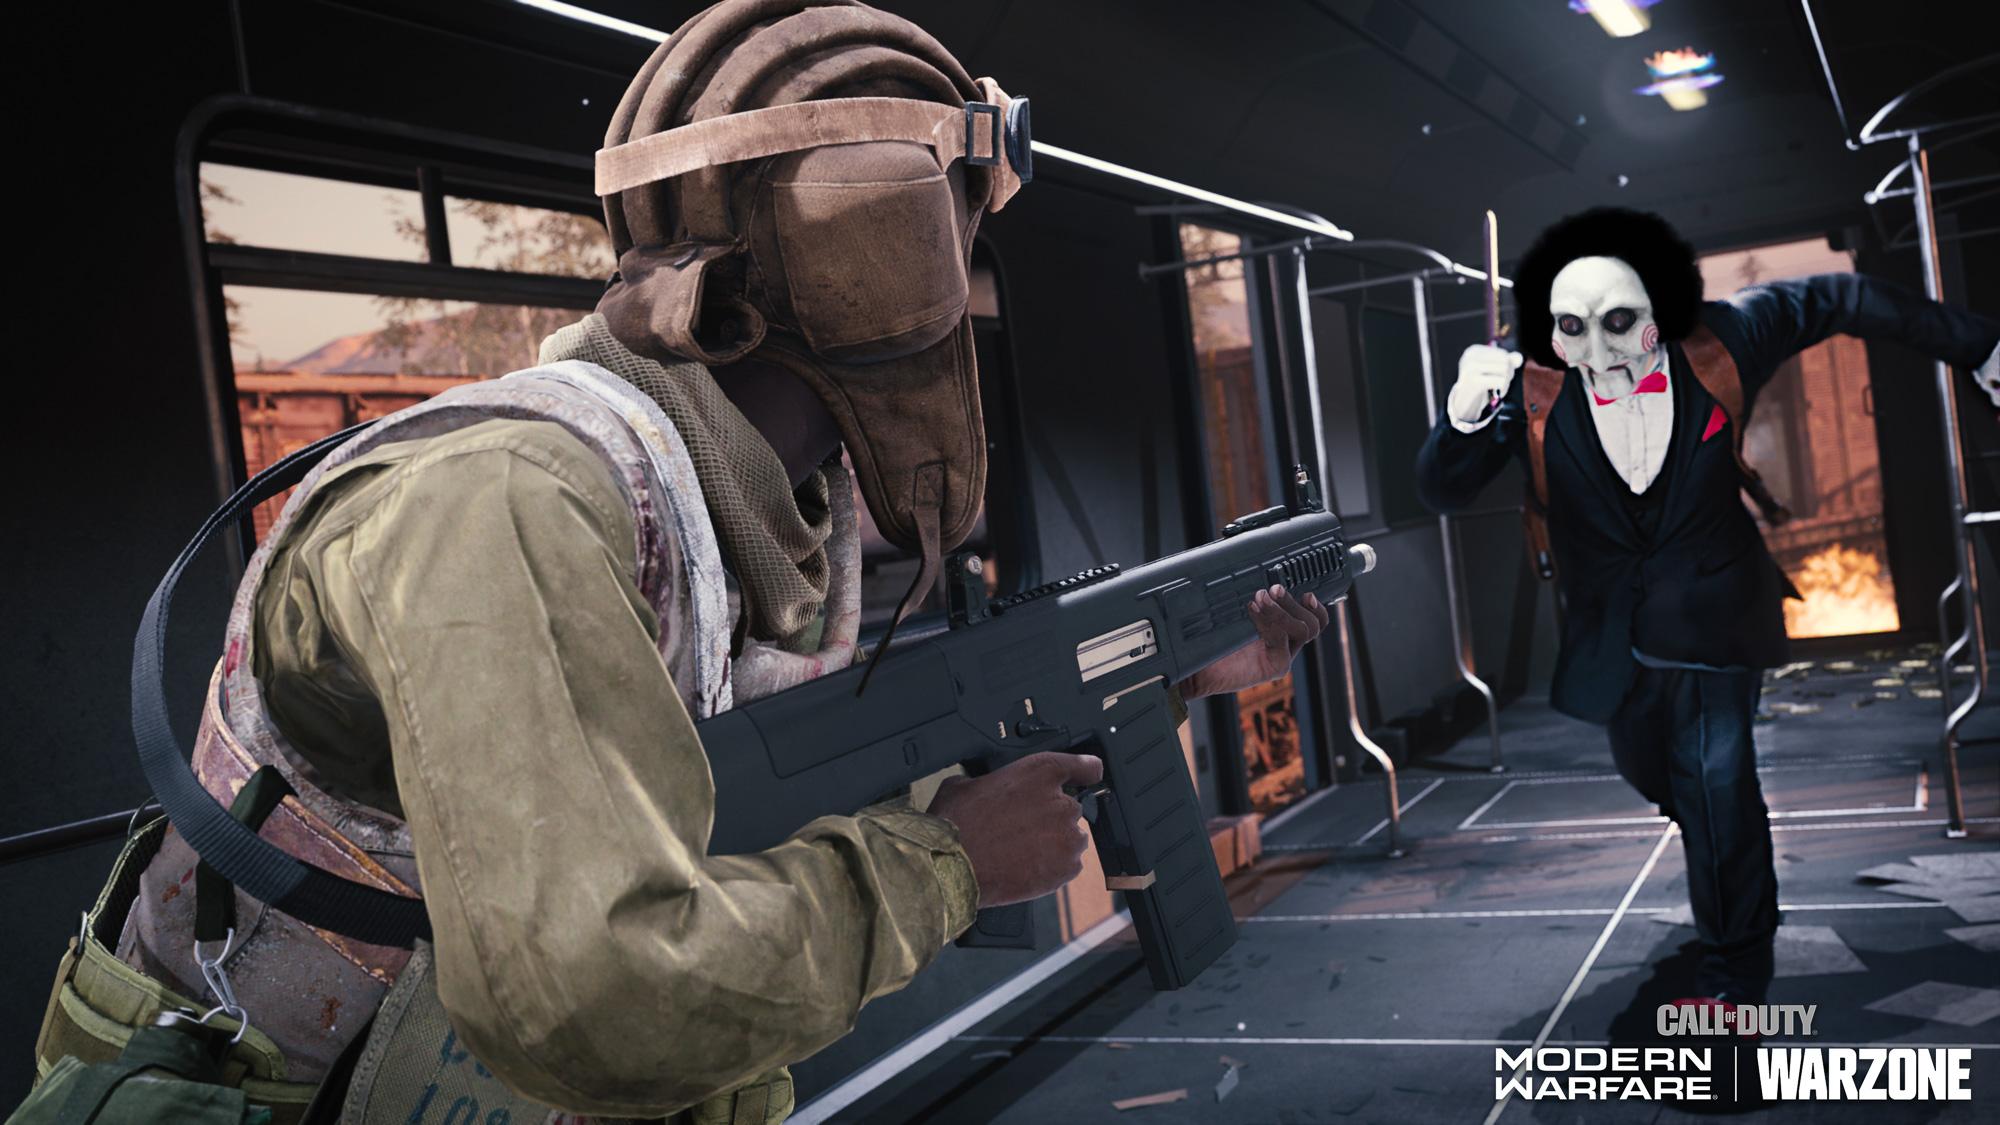 Call of Duty: Modern Warfare/ Warzone Haunting of Verdansk